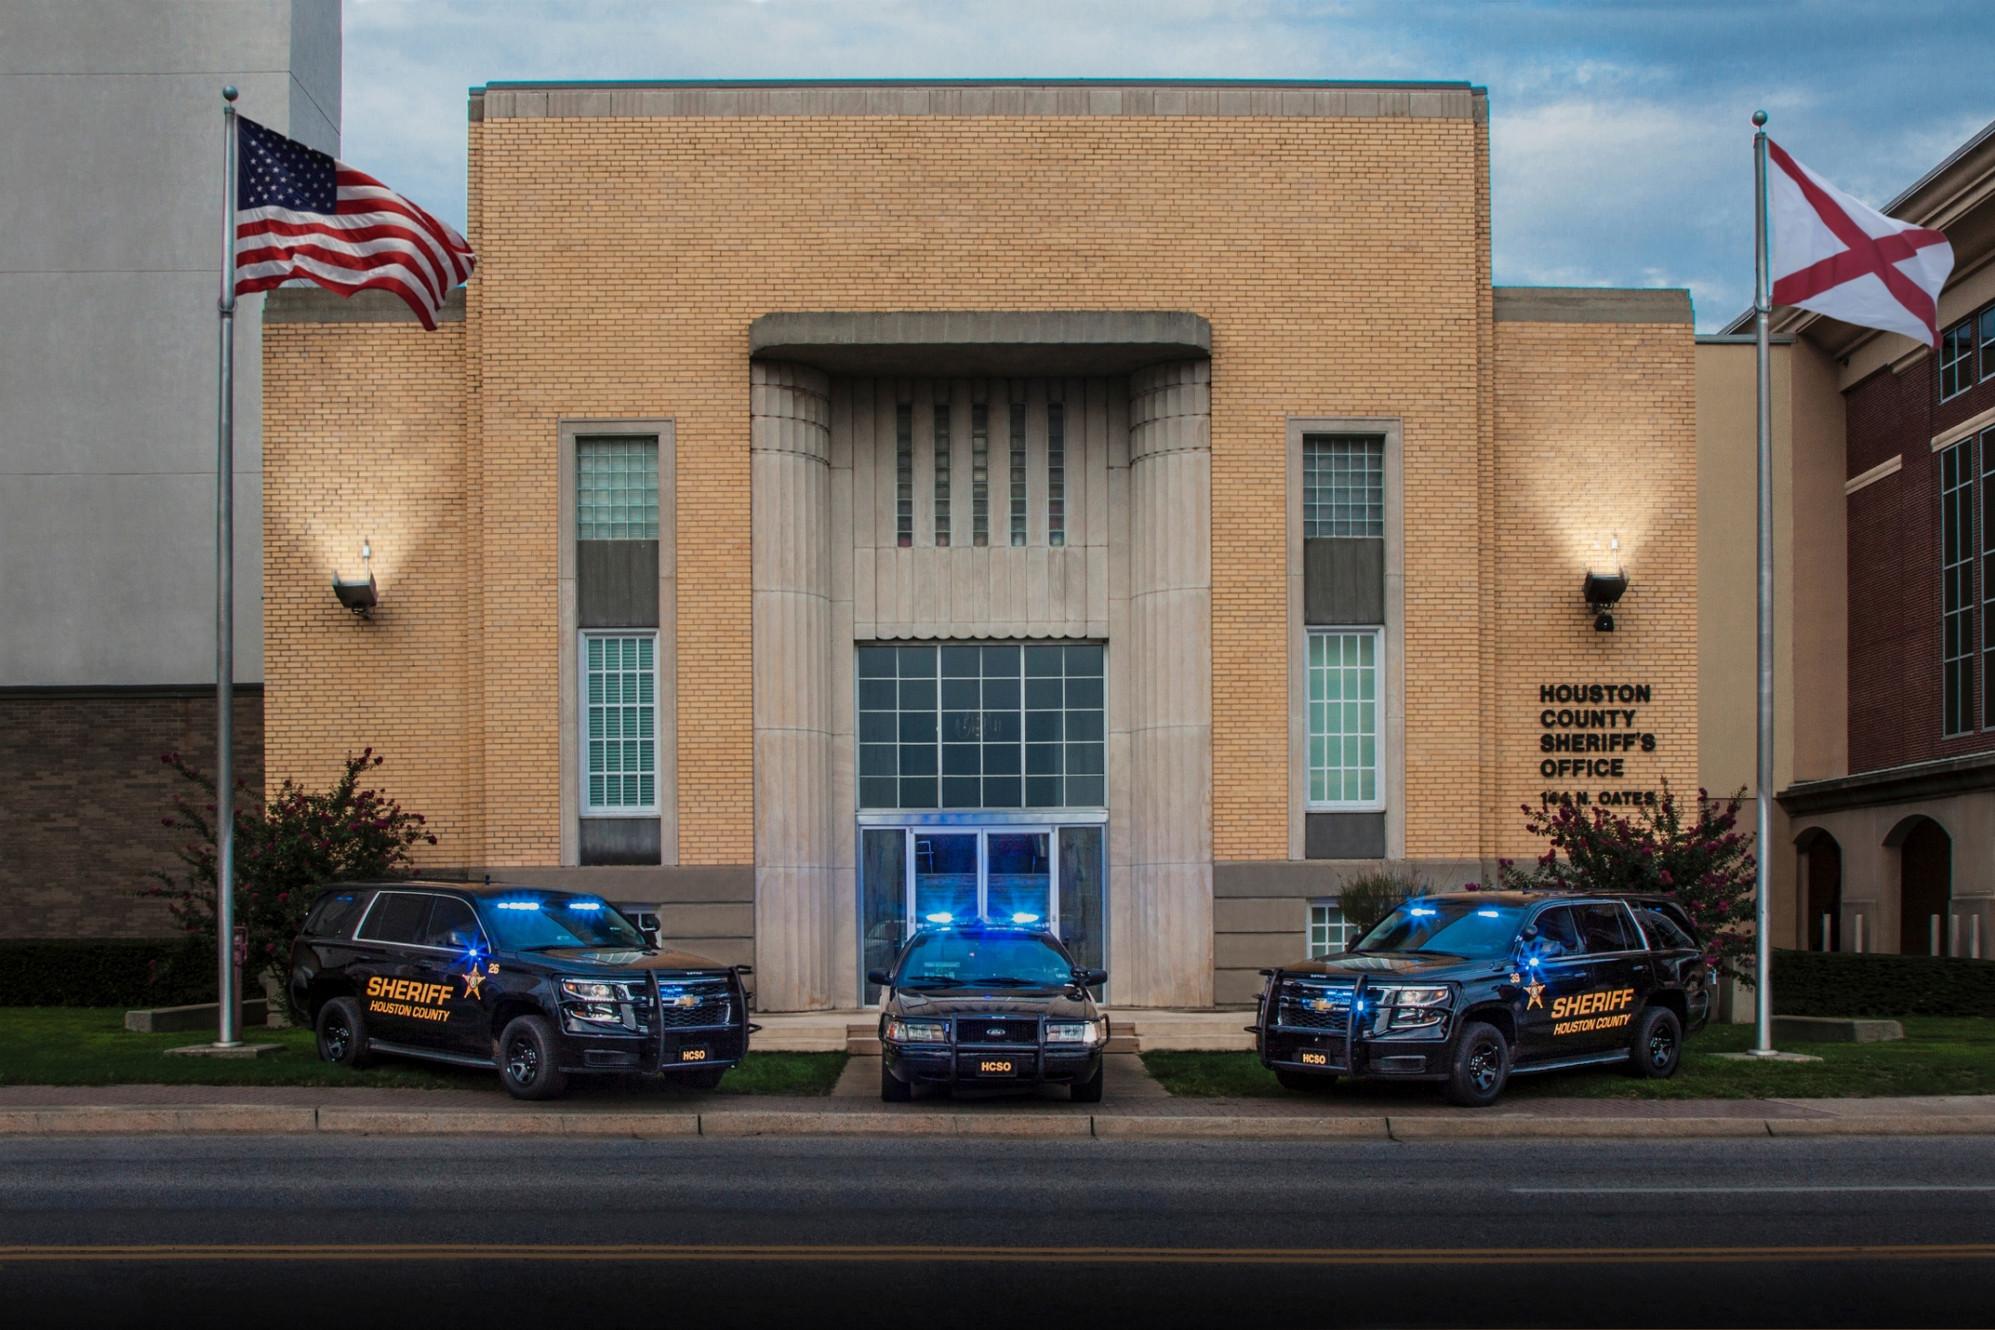 houston county sheriff department arrest records